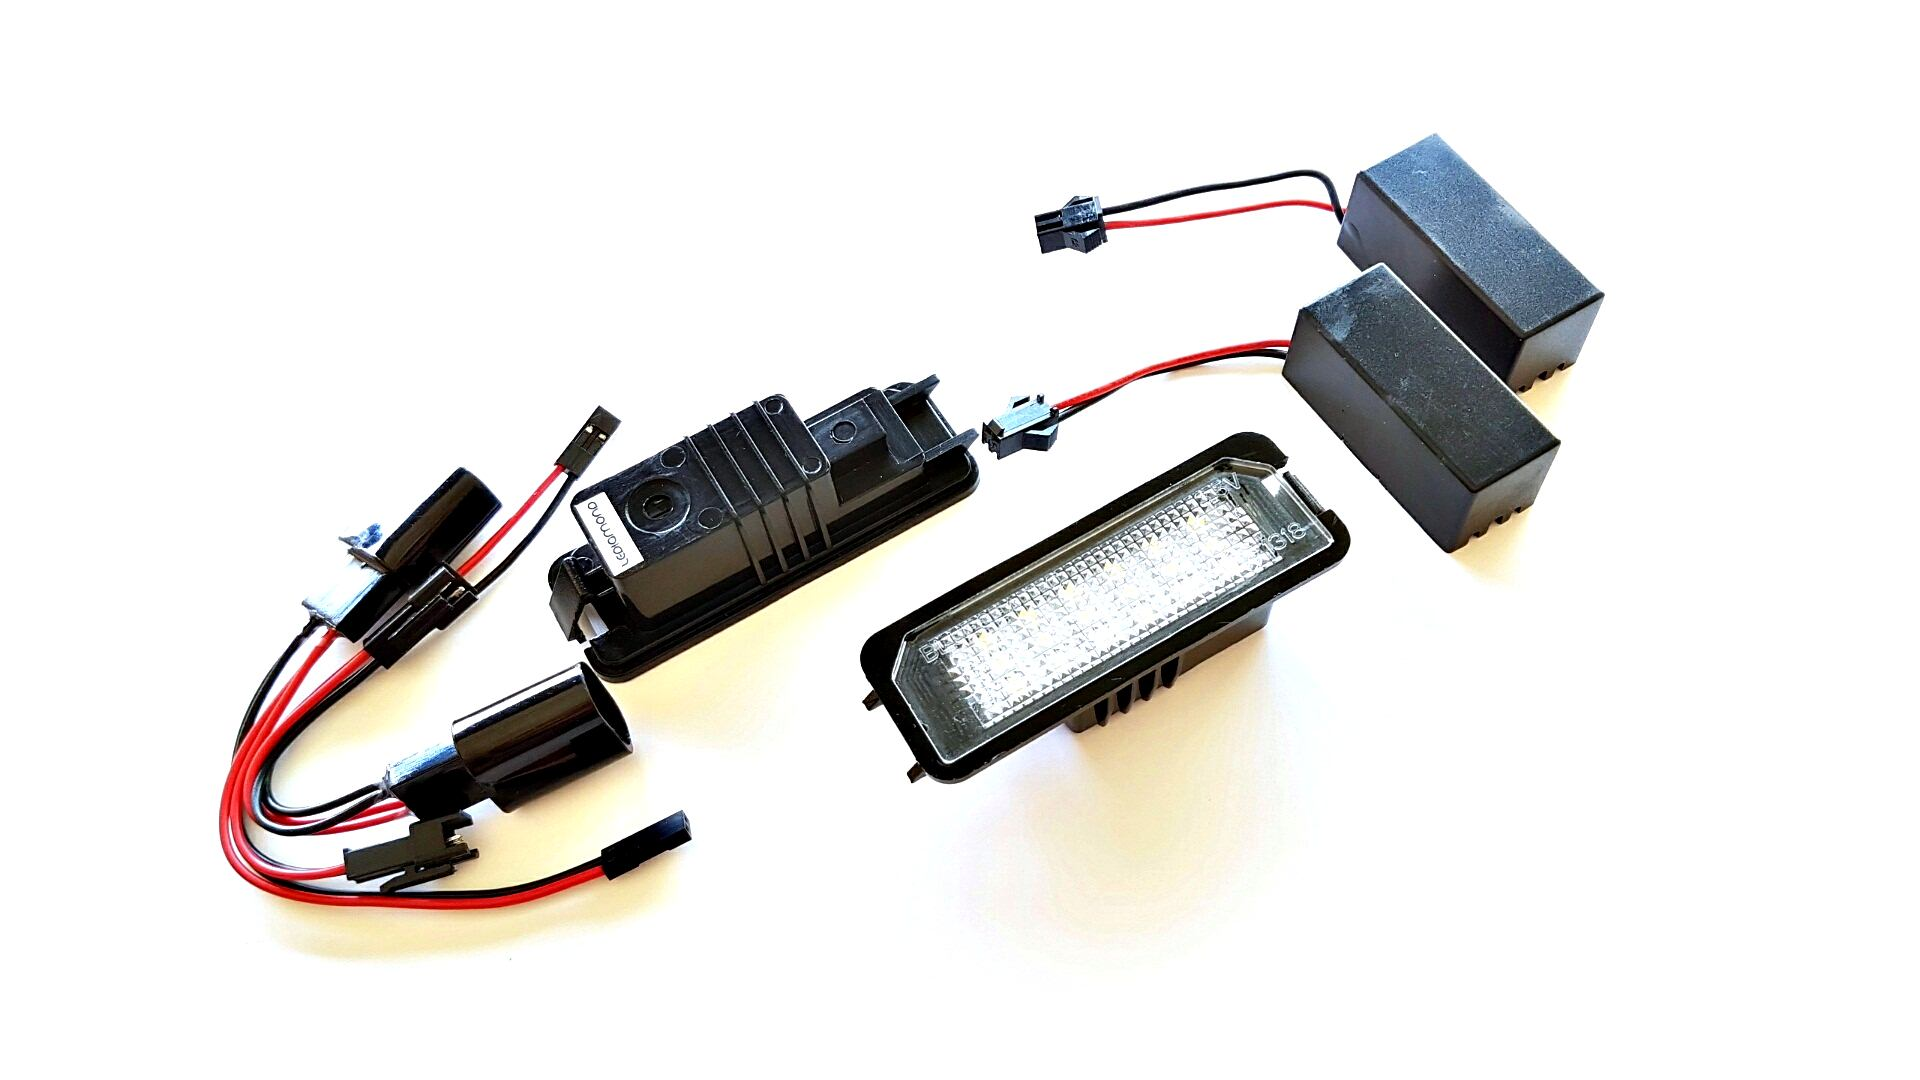 PLAFONES MATRICULA LED BENTLEY LEDIAMOND LMD030601 (4)